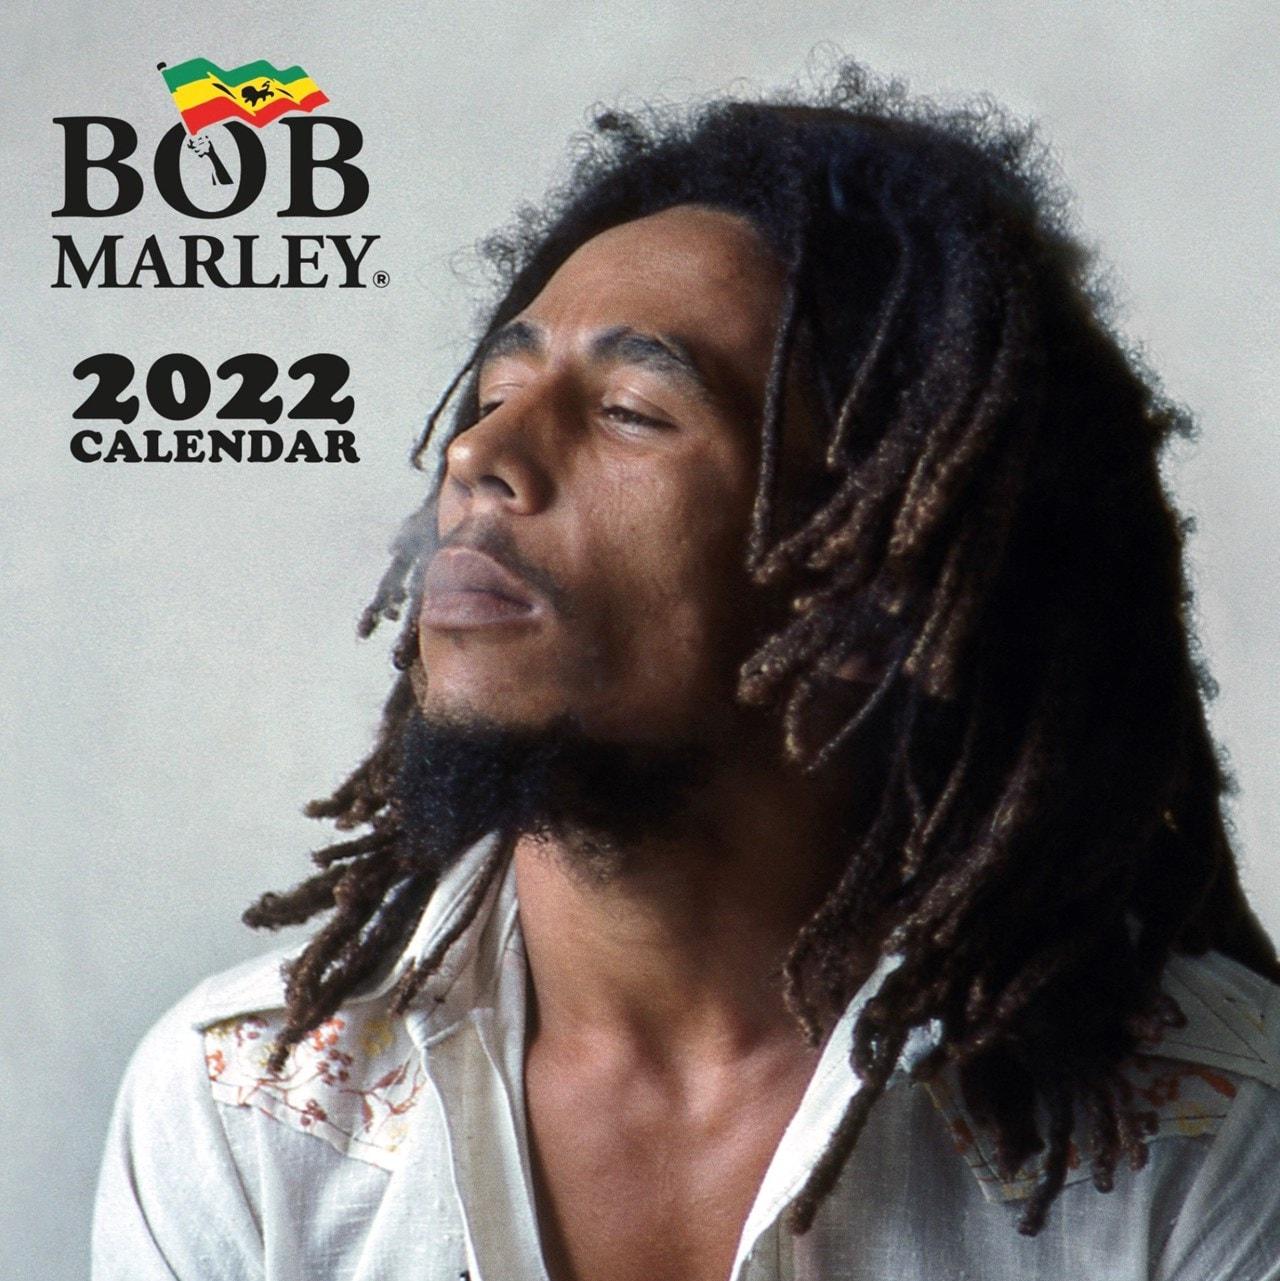 Bob Marley: Square 2022 Calendar - 1